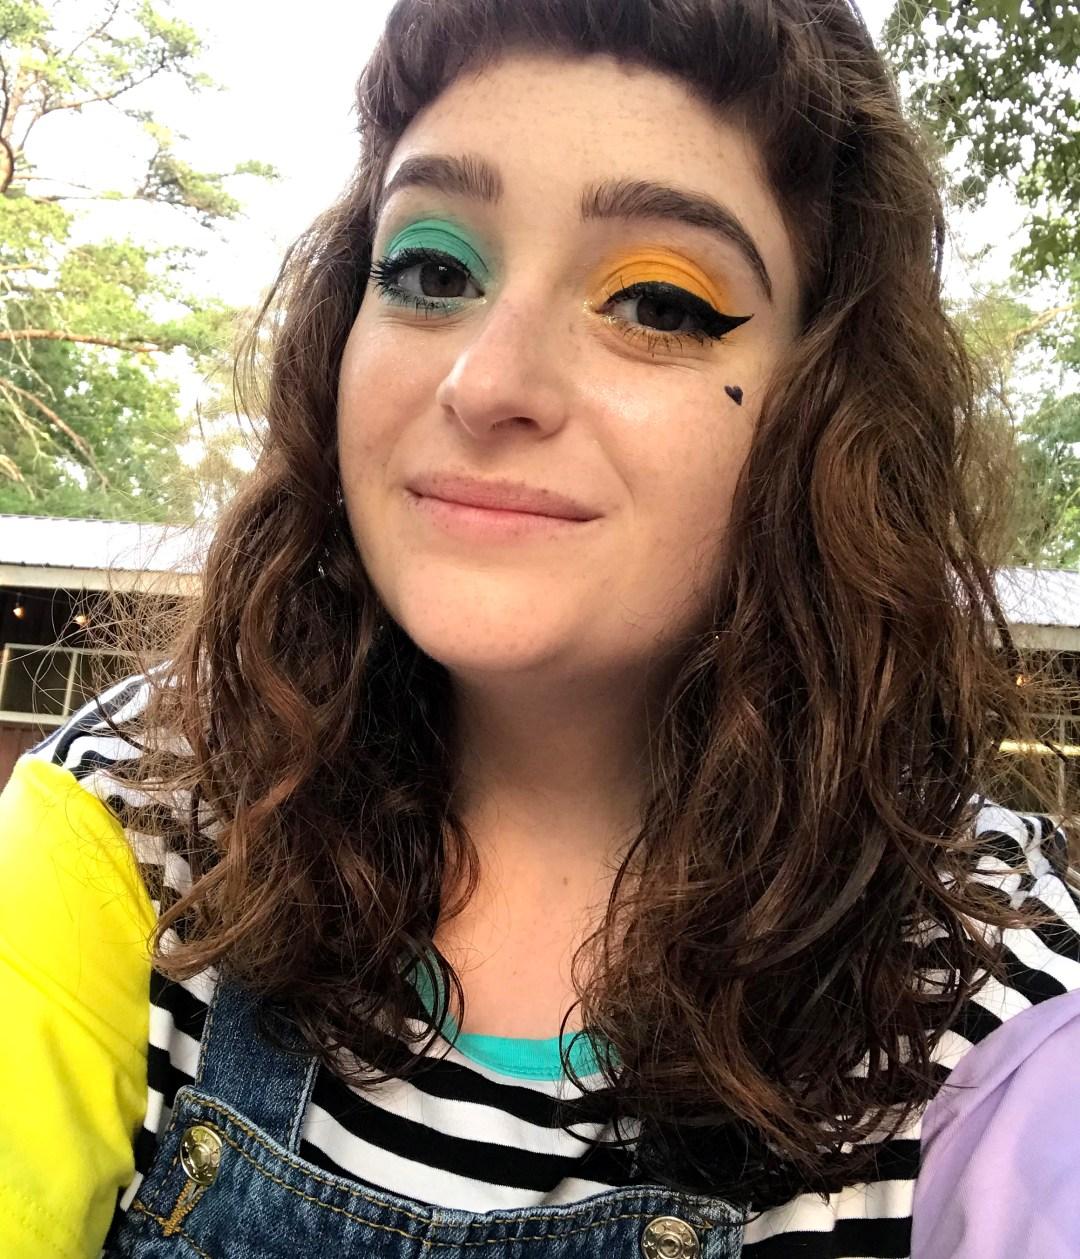 Camp Gritty makeup